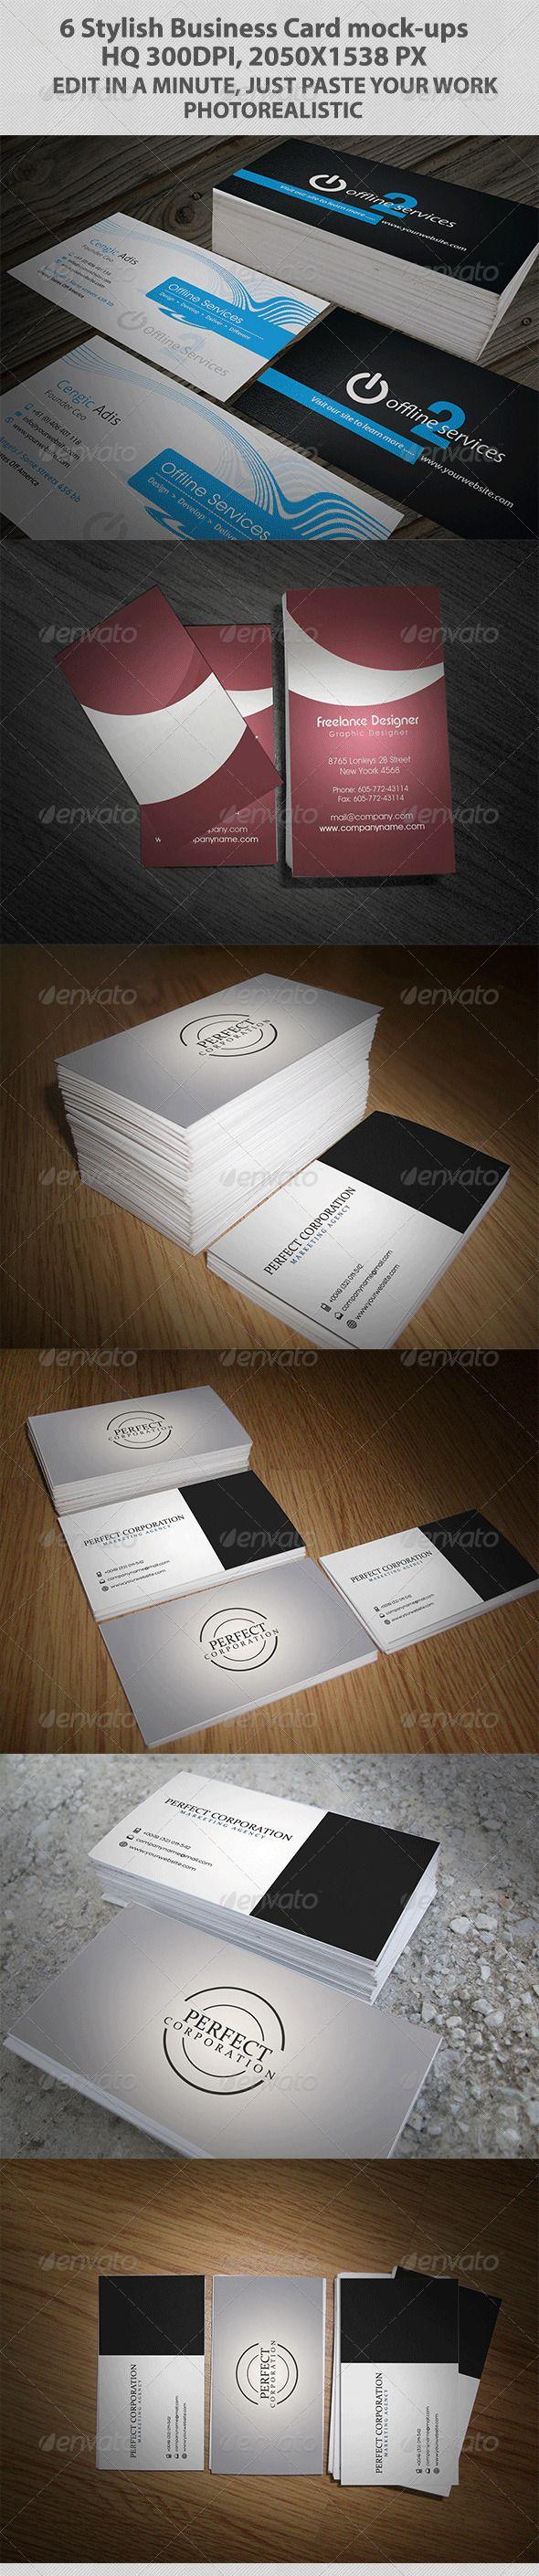 Six Stylish Business Card Mock Ups Mockup Business Cards And Stylish